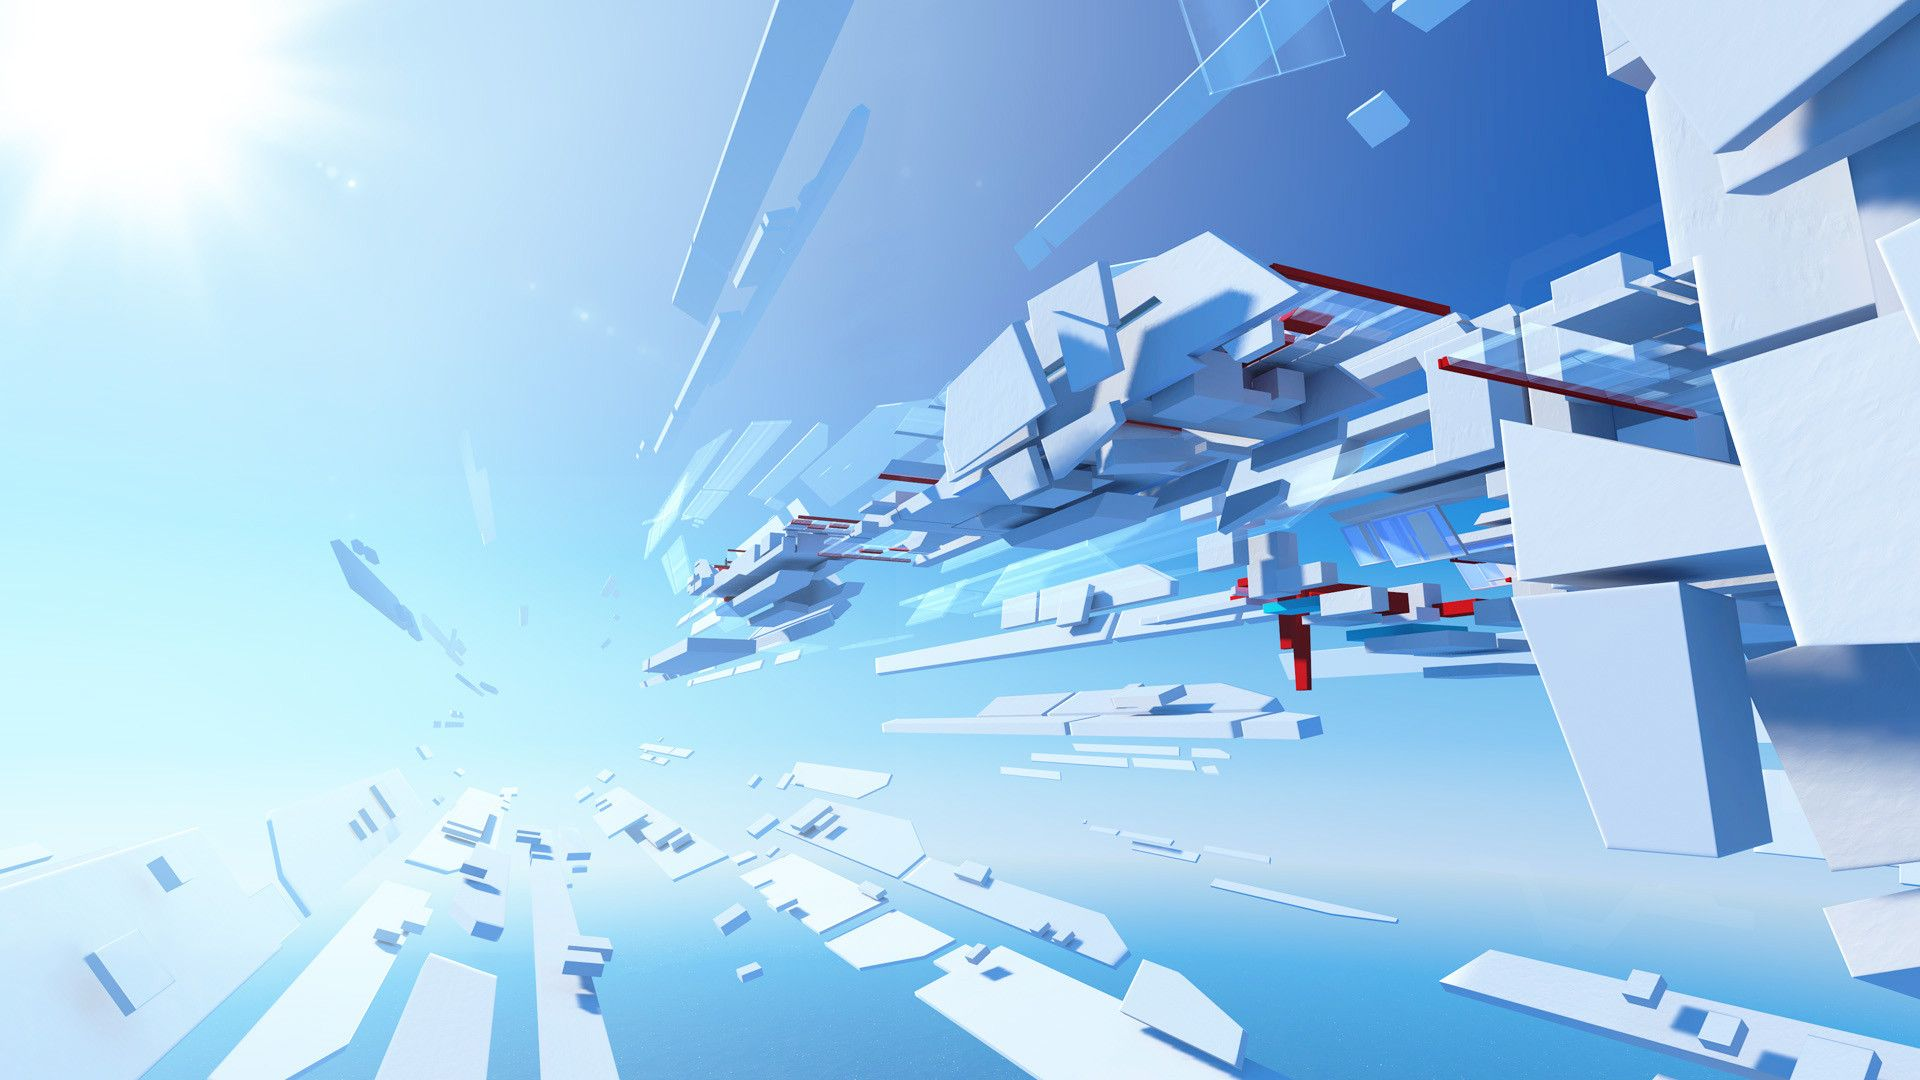 50 Mirror S Edge Wallpapers In 2020 Blue Artwork Hd Wallpaper